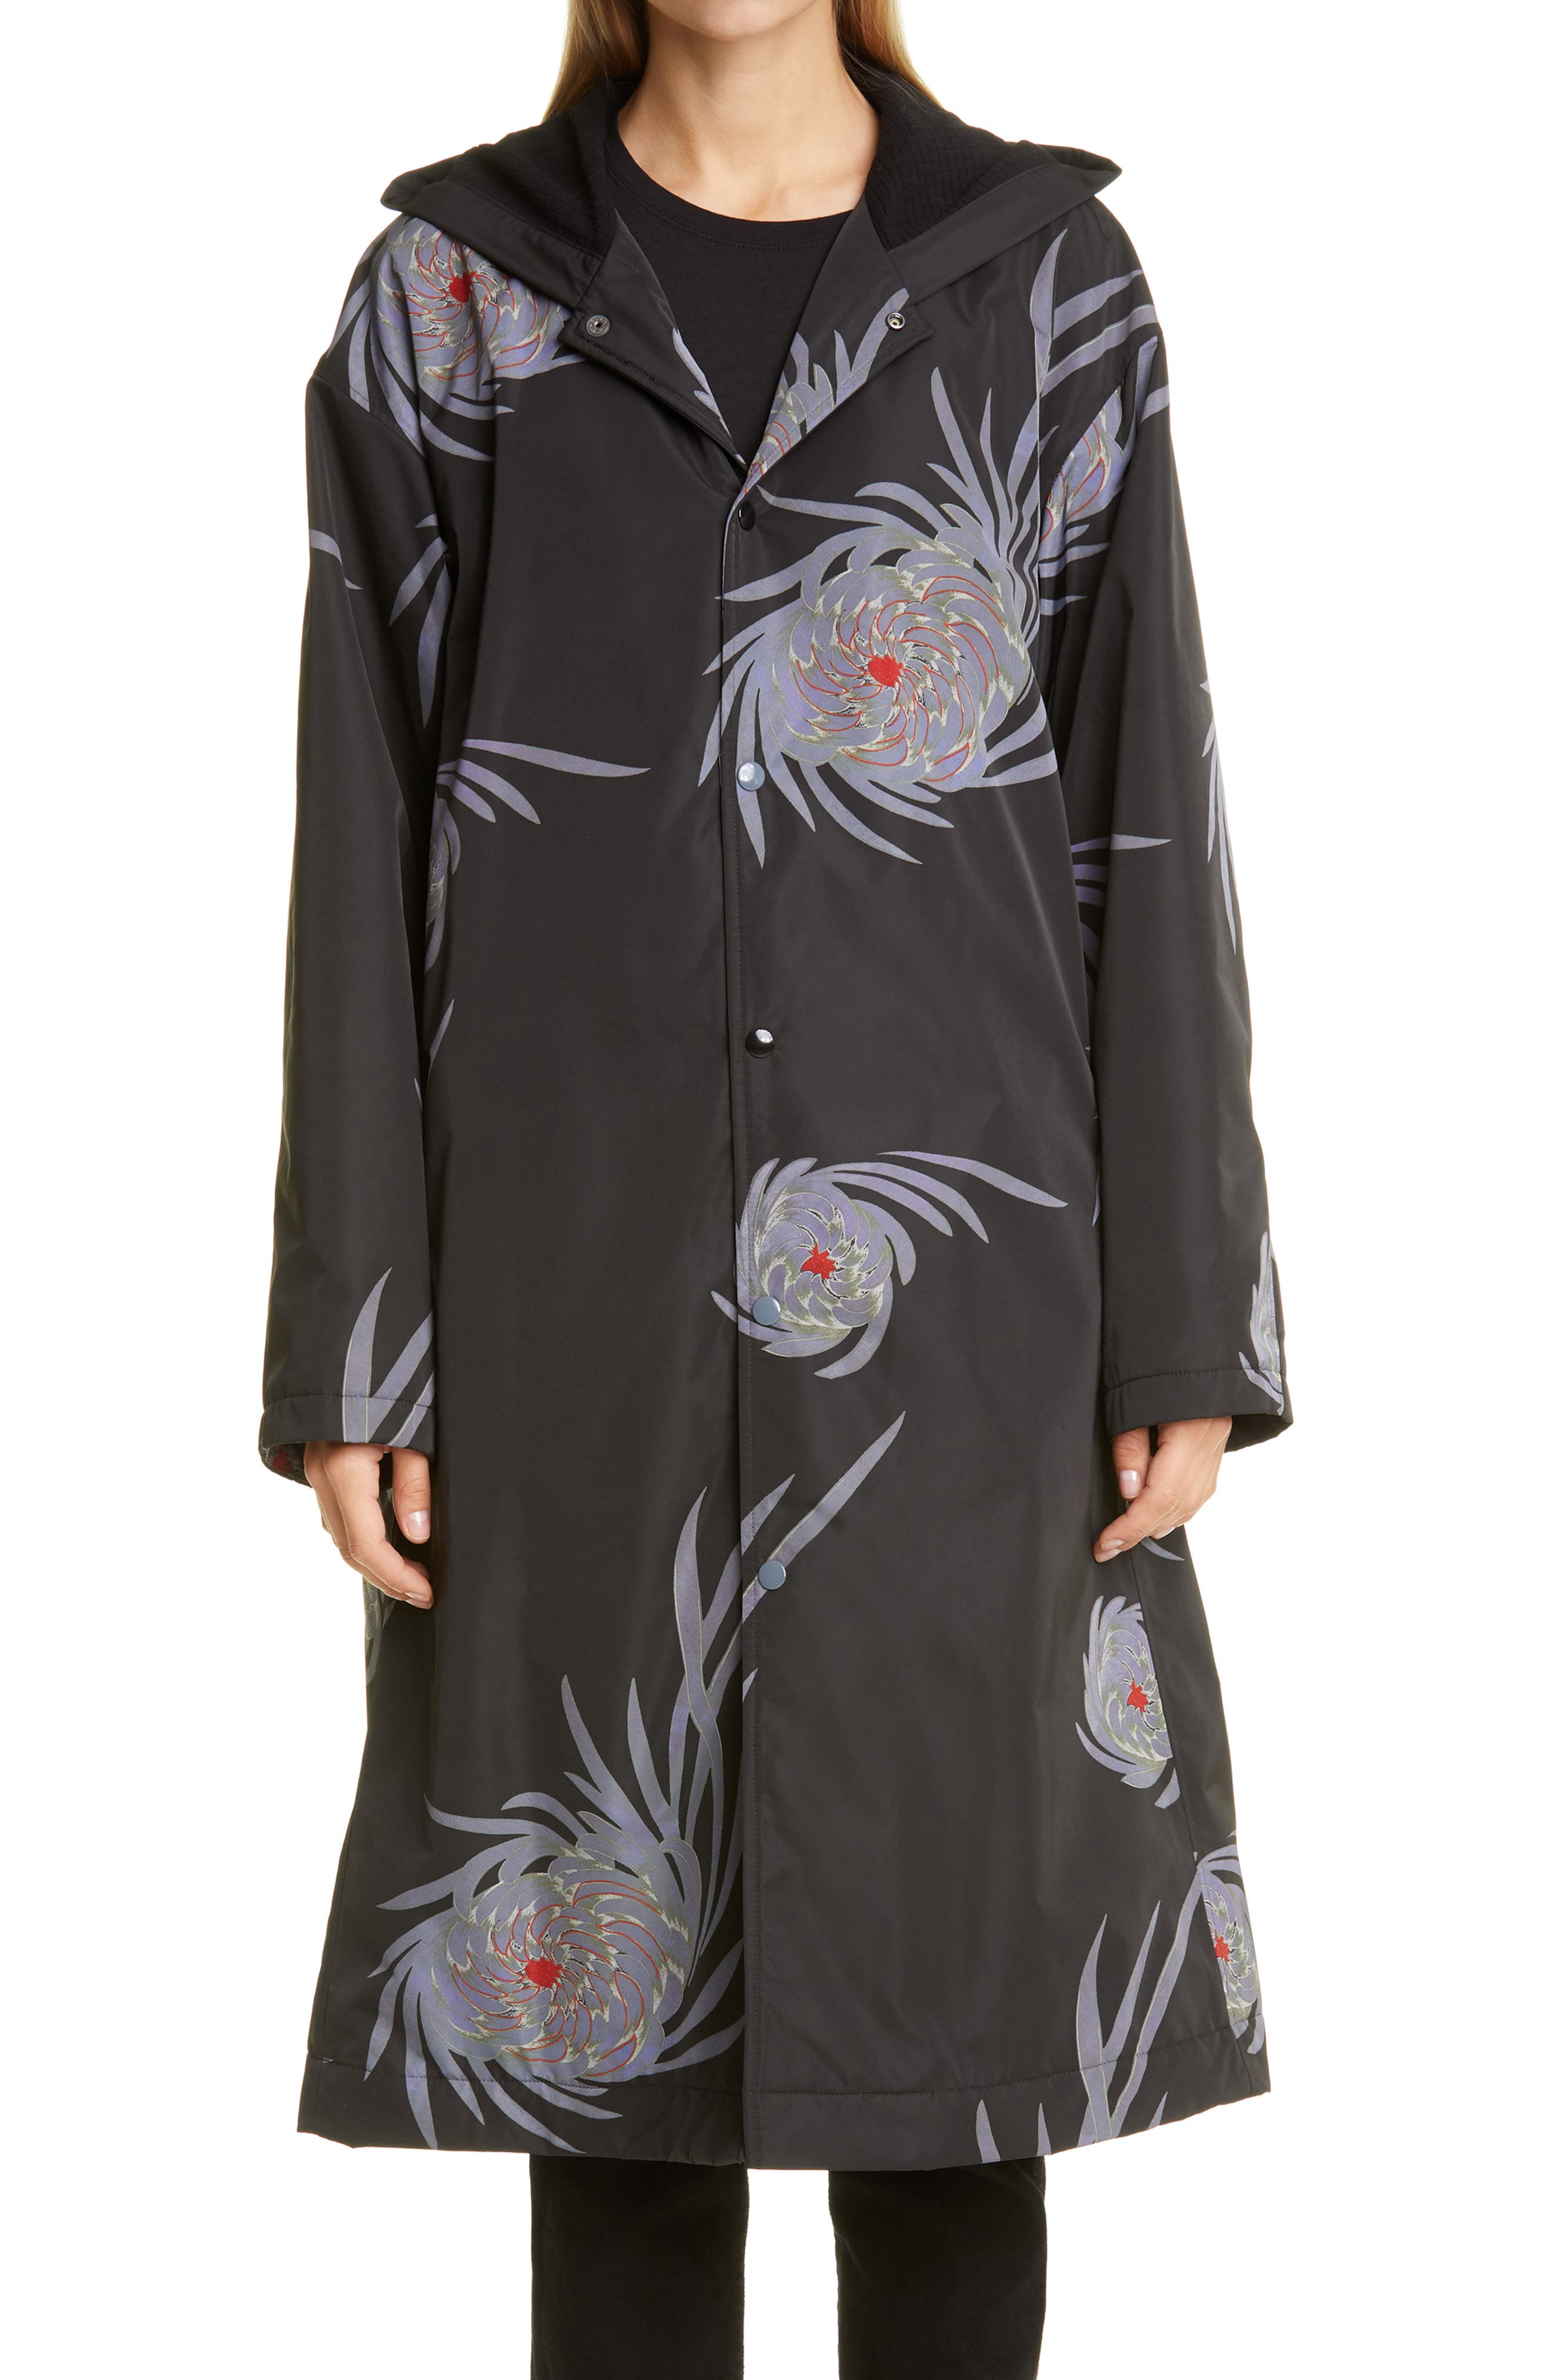 Undercover Chrysanthemum Print Hooded Long Coat | Nordstrom